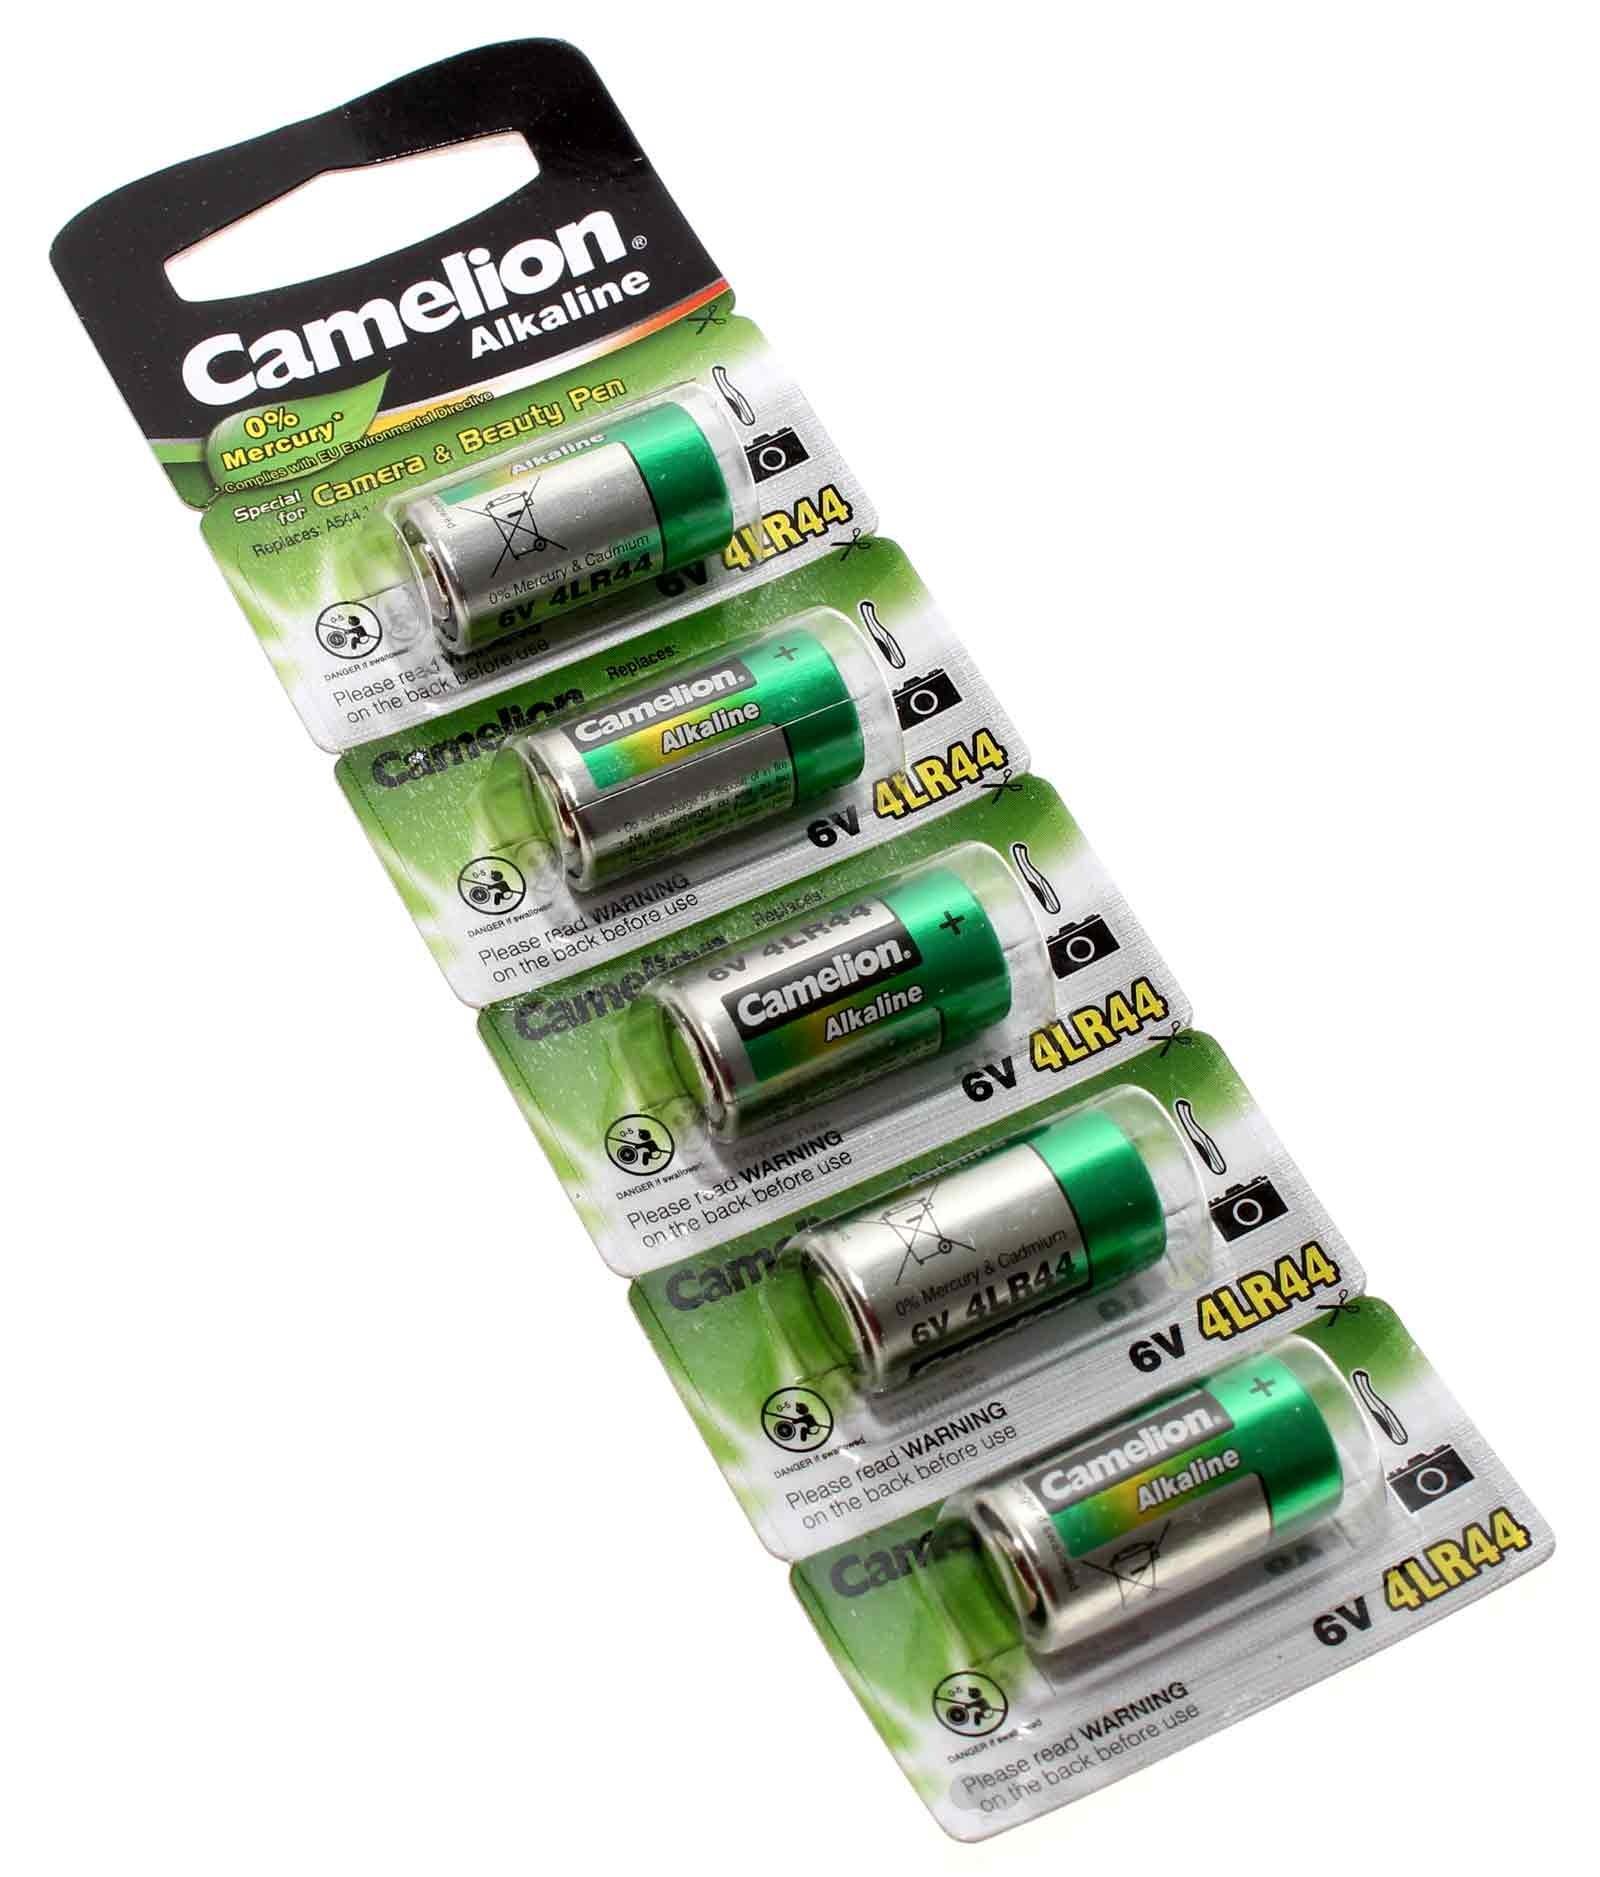 5er Pack Camelion 4LR44 Alkaline Spezial Batterie, 6V, 150mAh, wie 4LR44P, A476, E476A